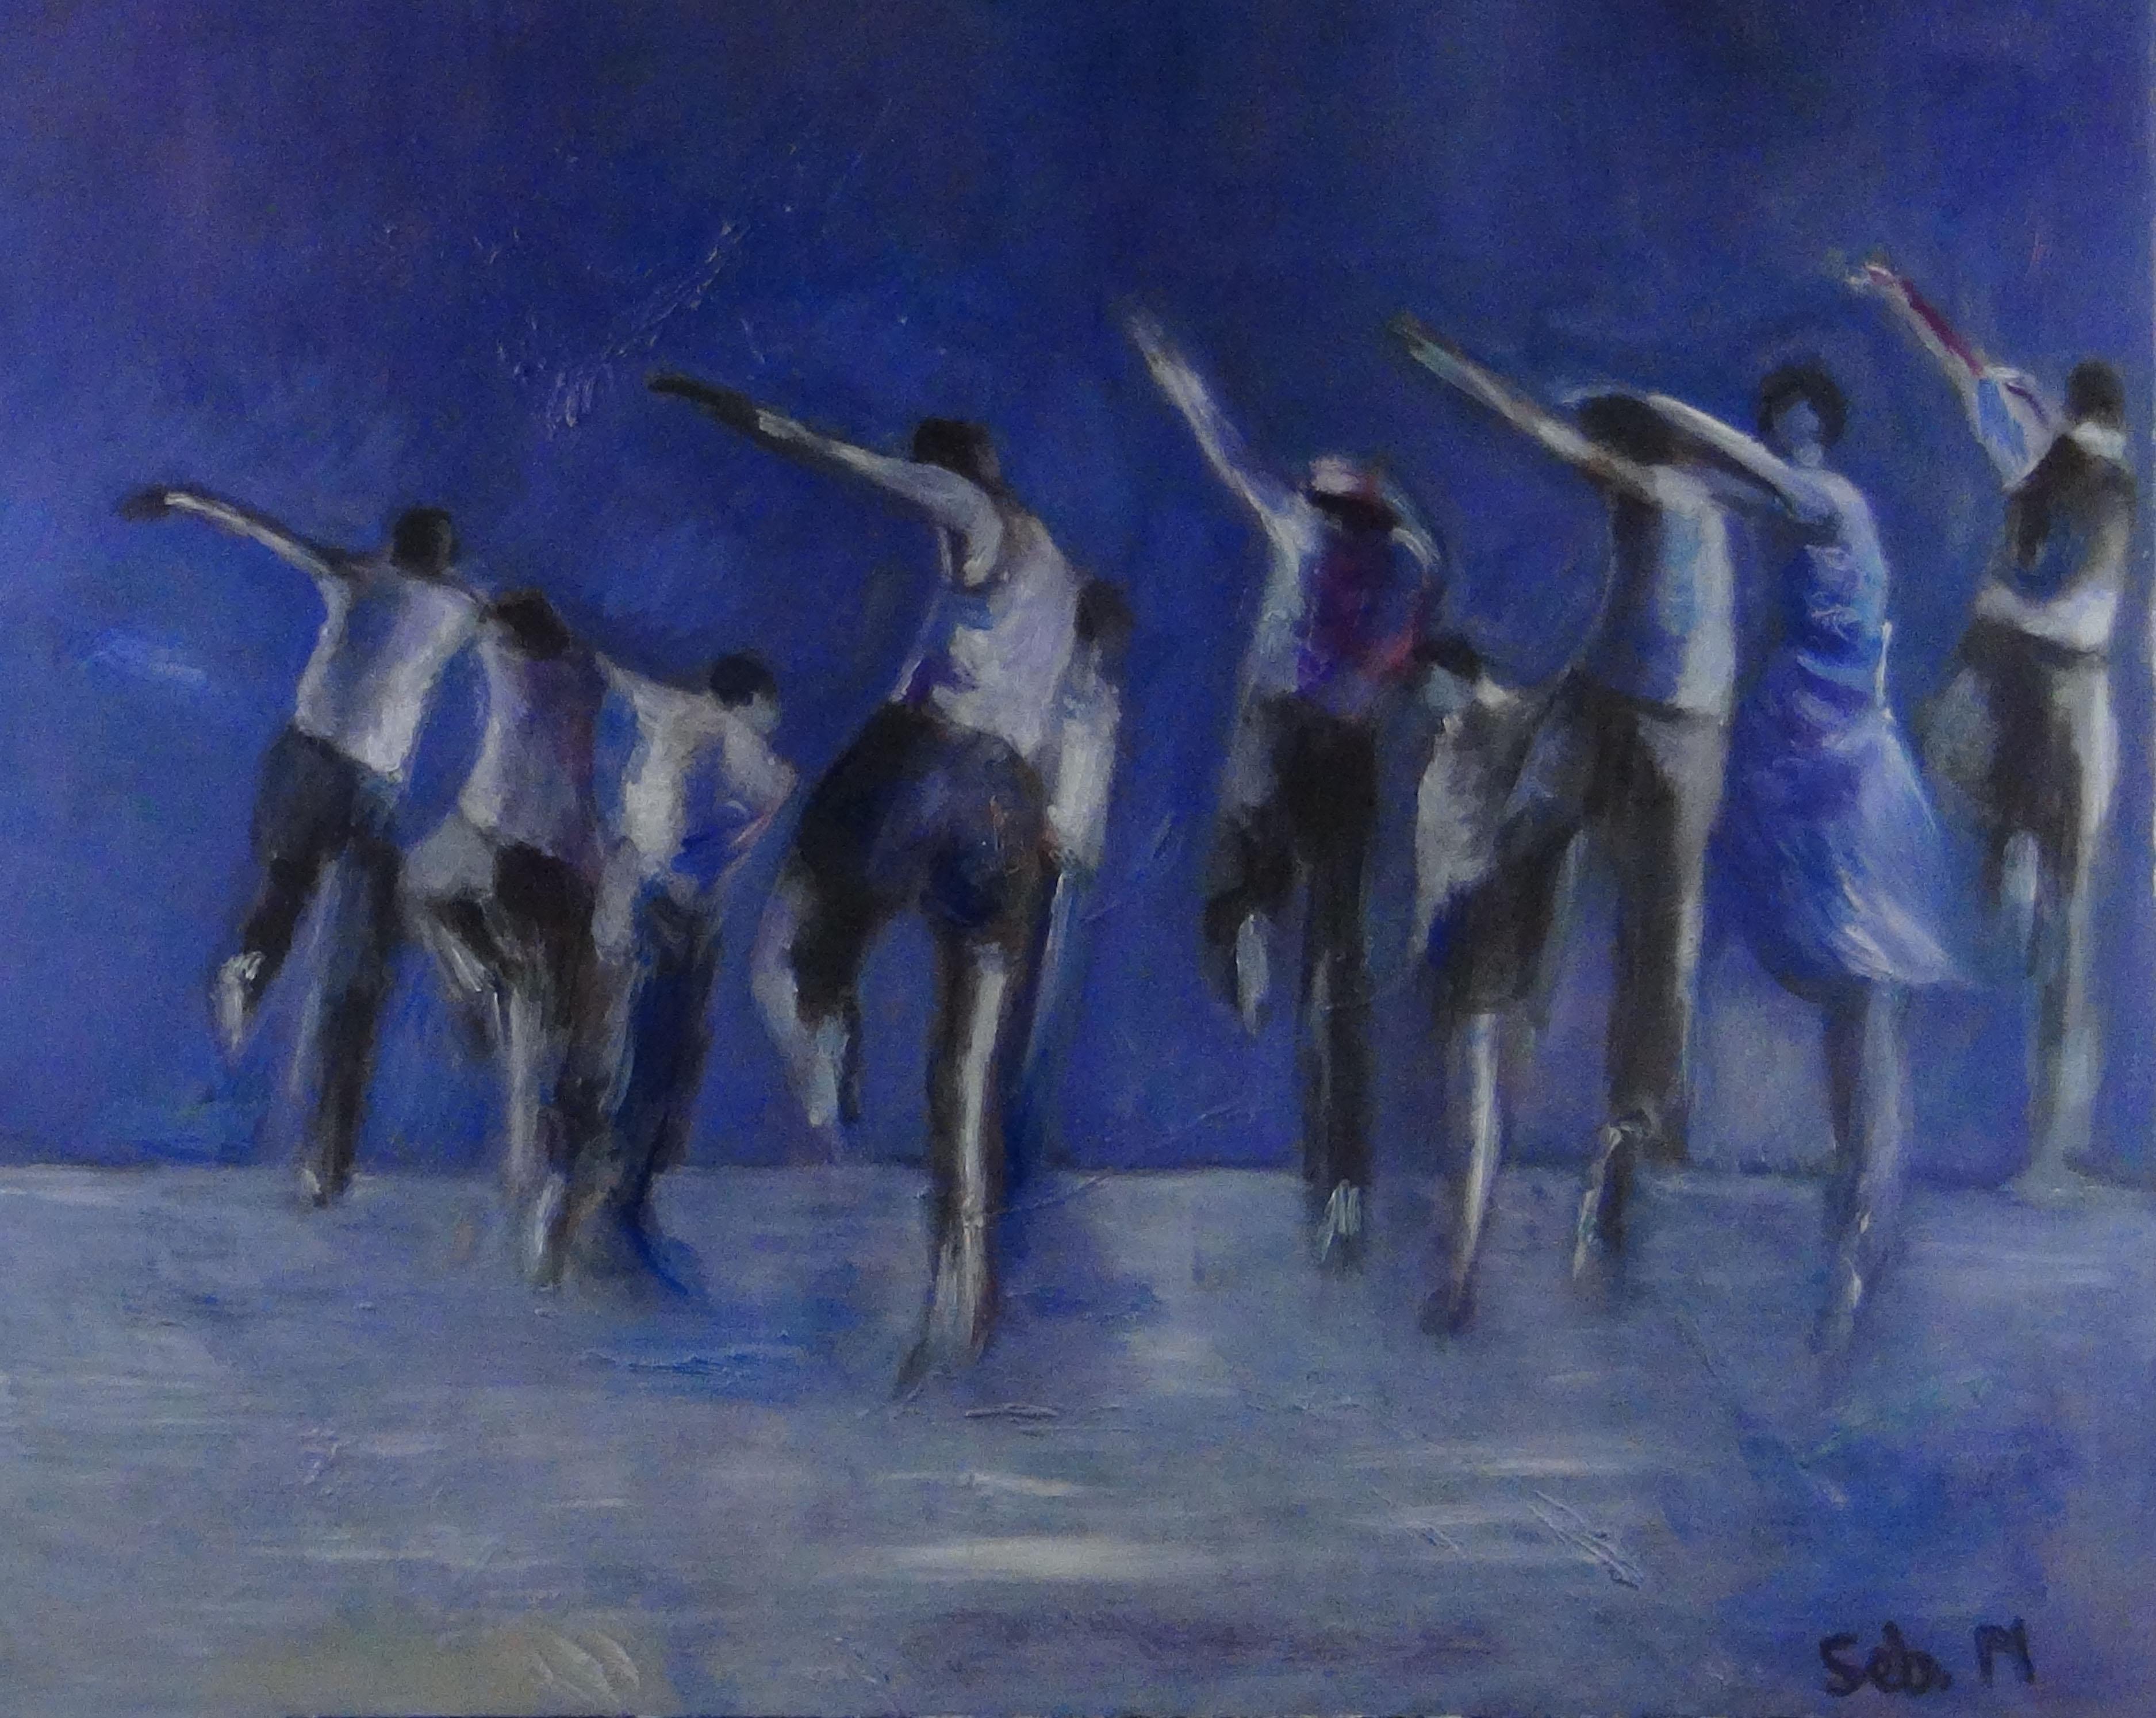 Dancers in Unisom